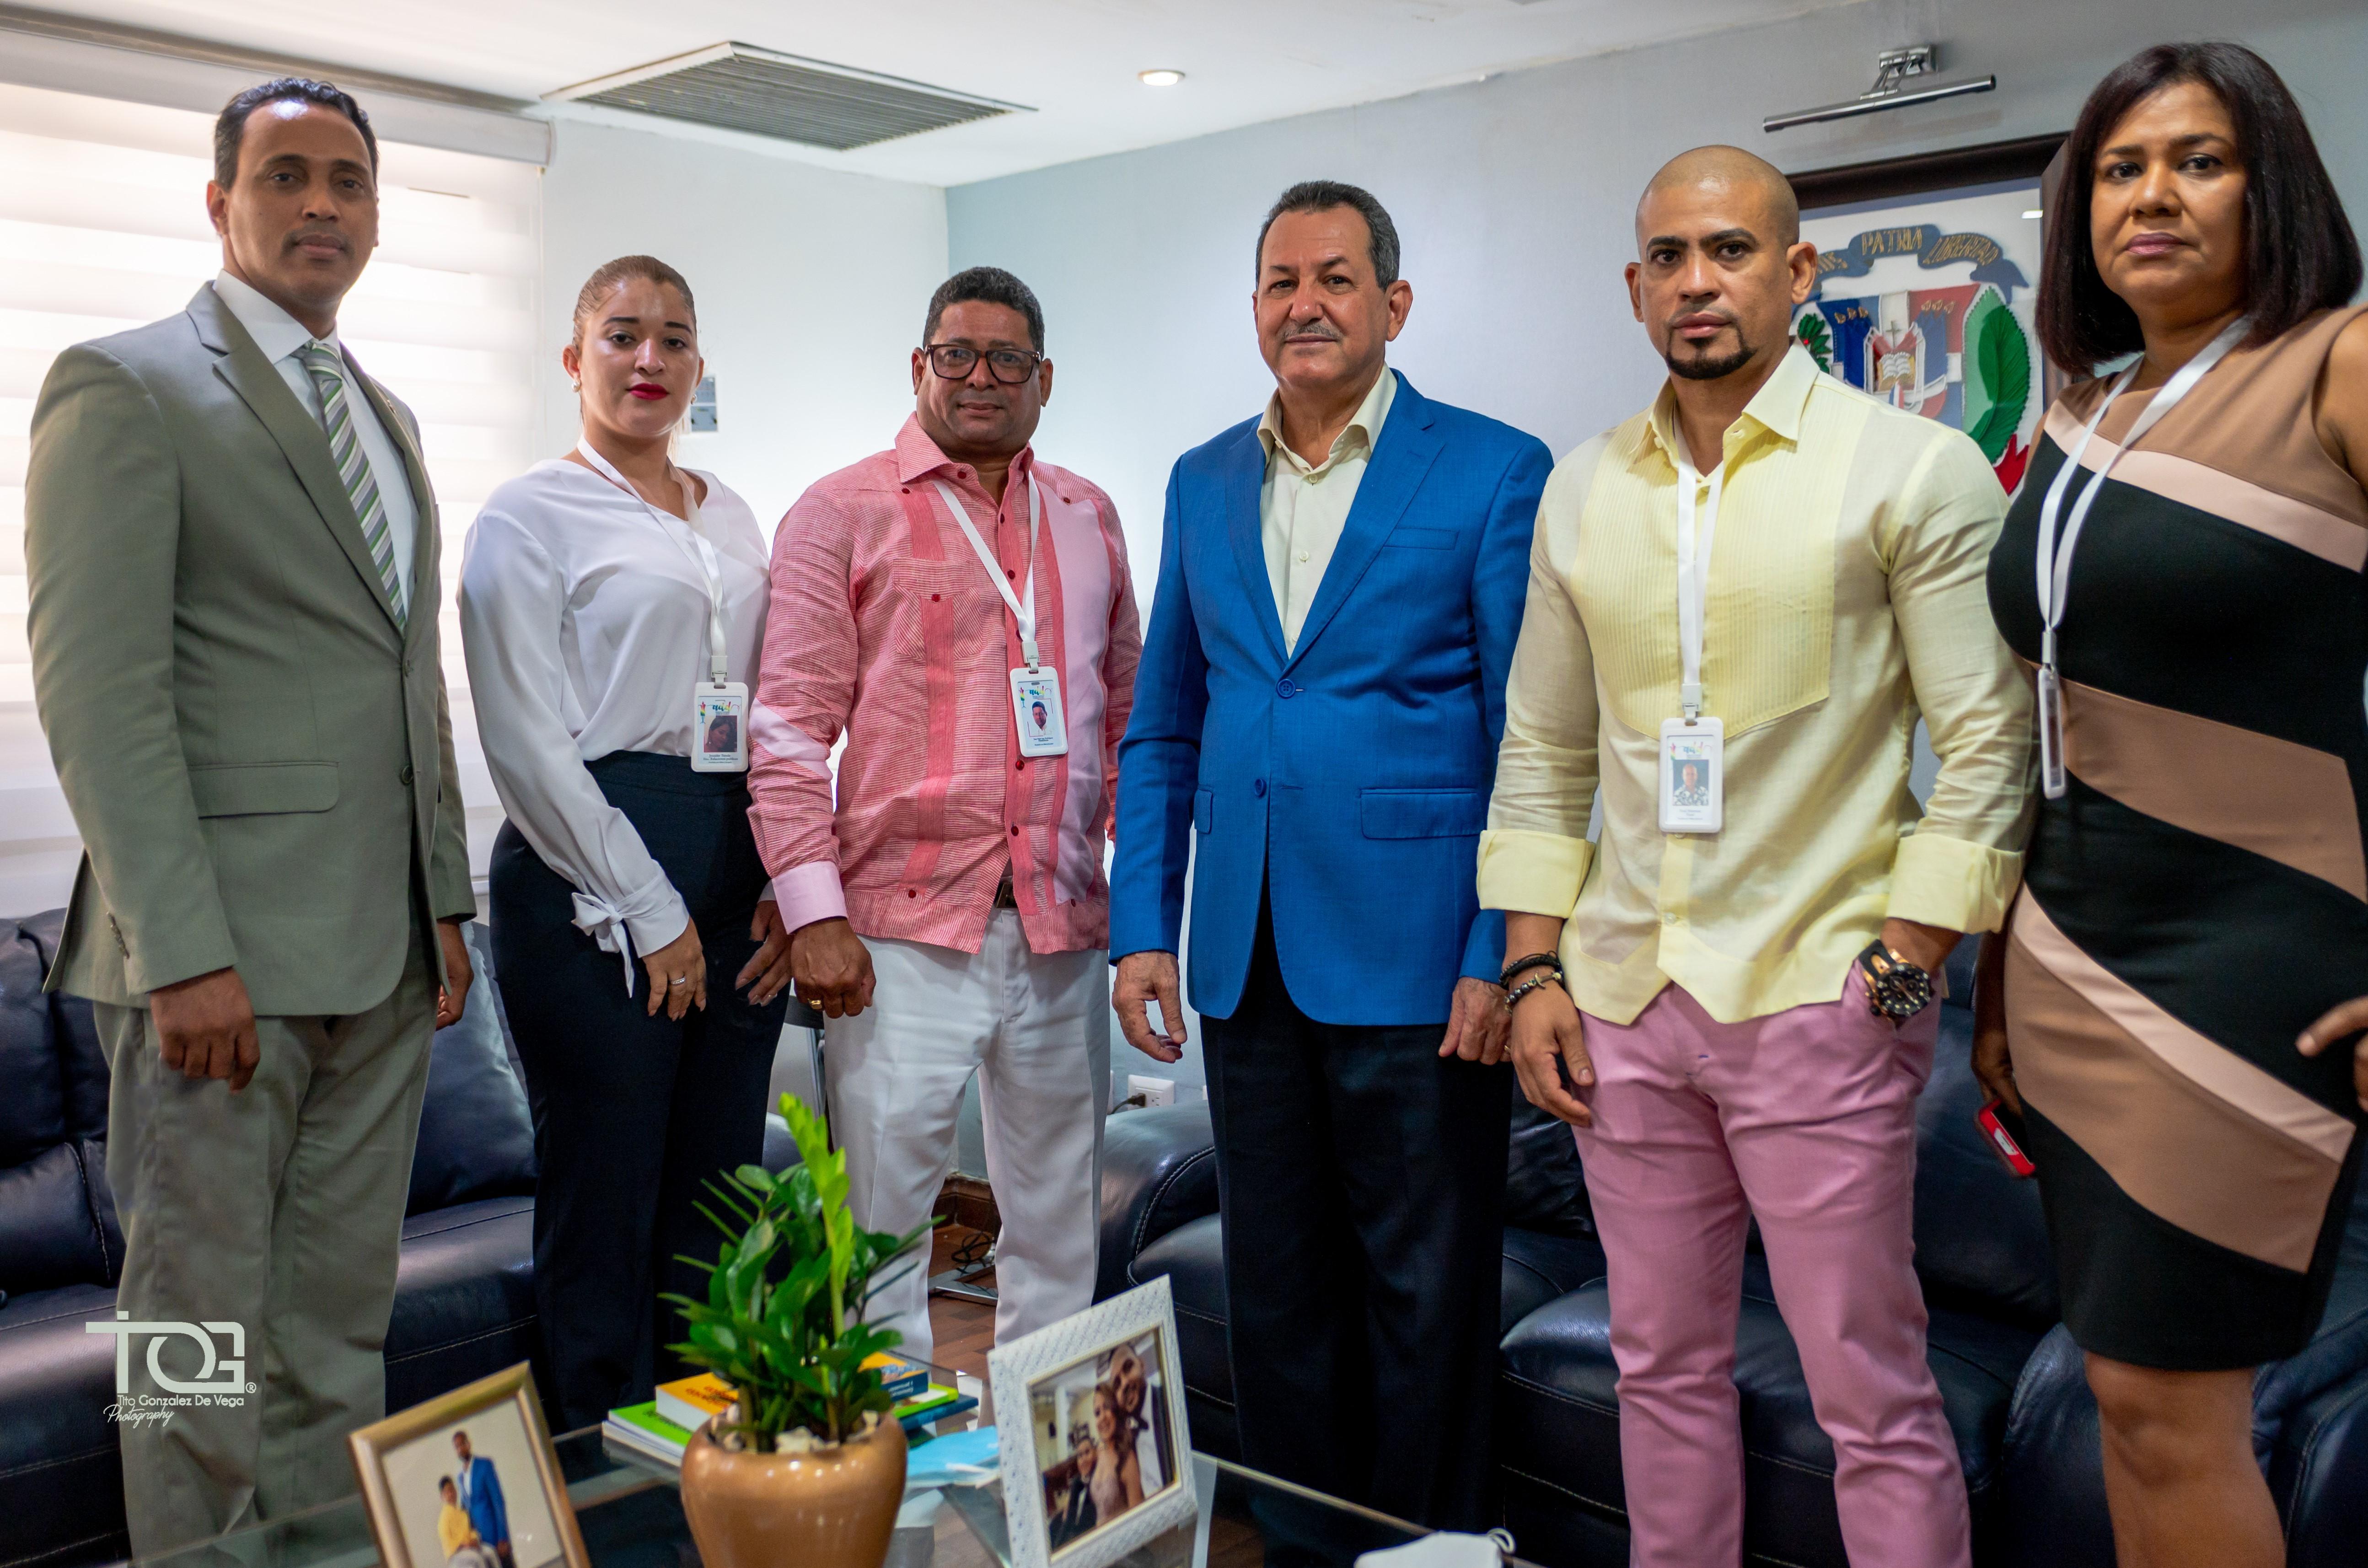 Asociación de Diseñadores Dominicanos realiza acuerdo con Banca Solidaria para apoyar emprendedores